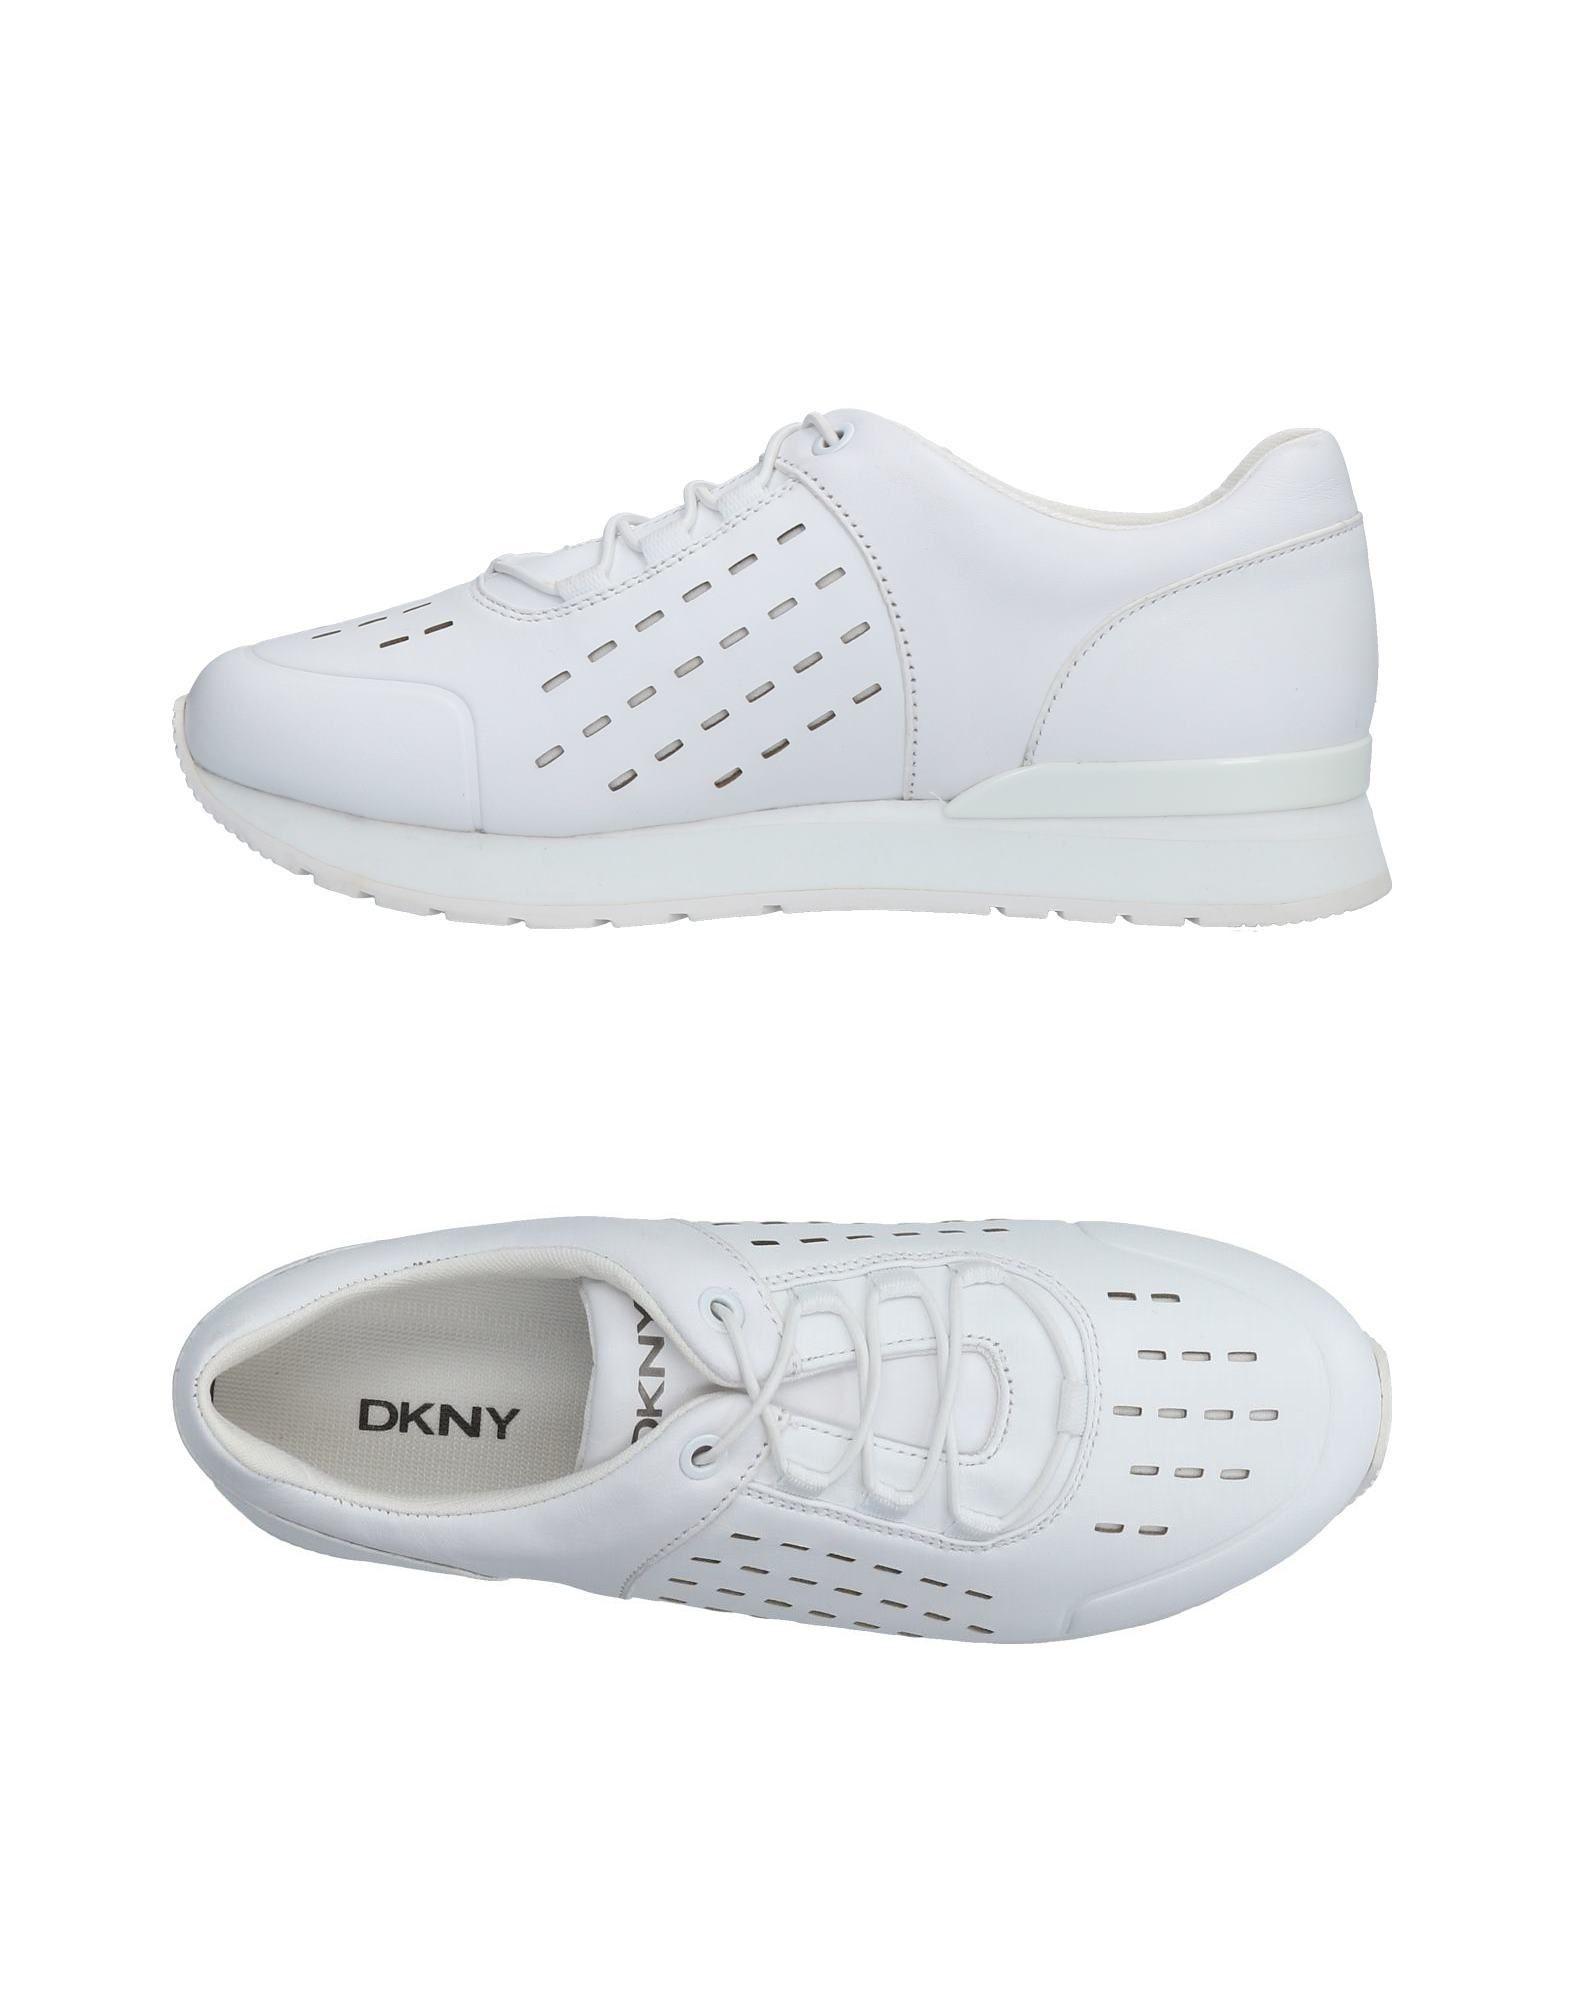 Dkny Sneakers Damen  11474811WG Heiße Schuhe